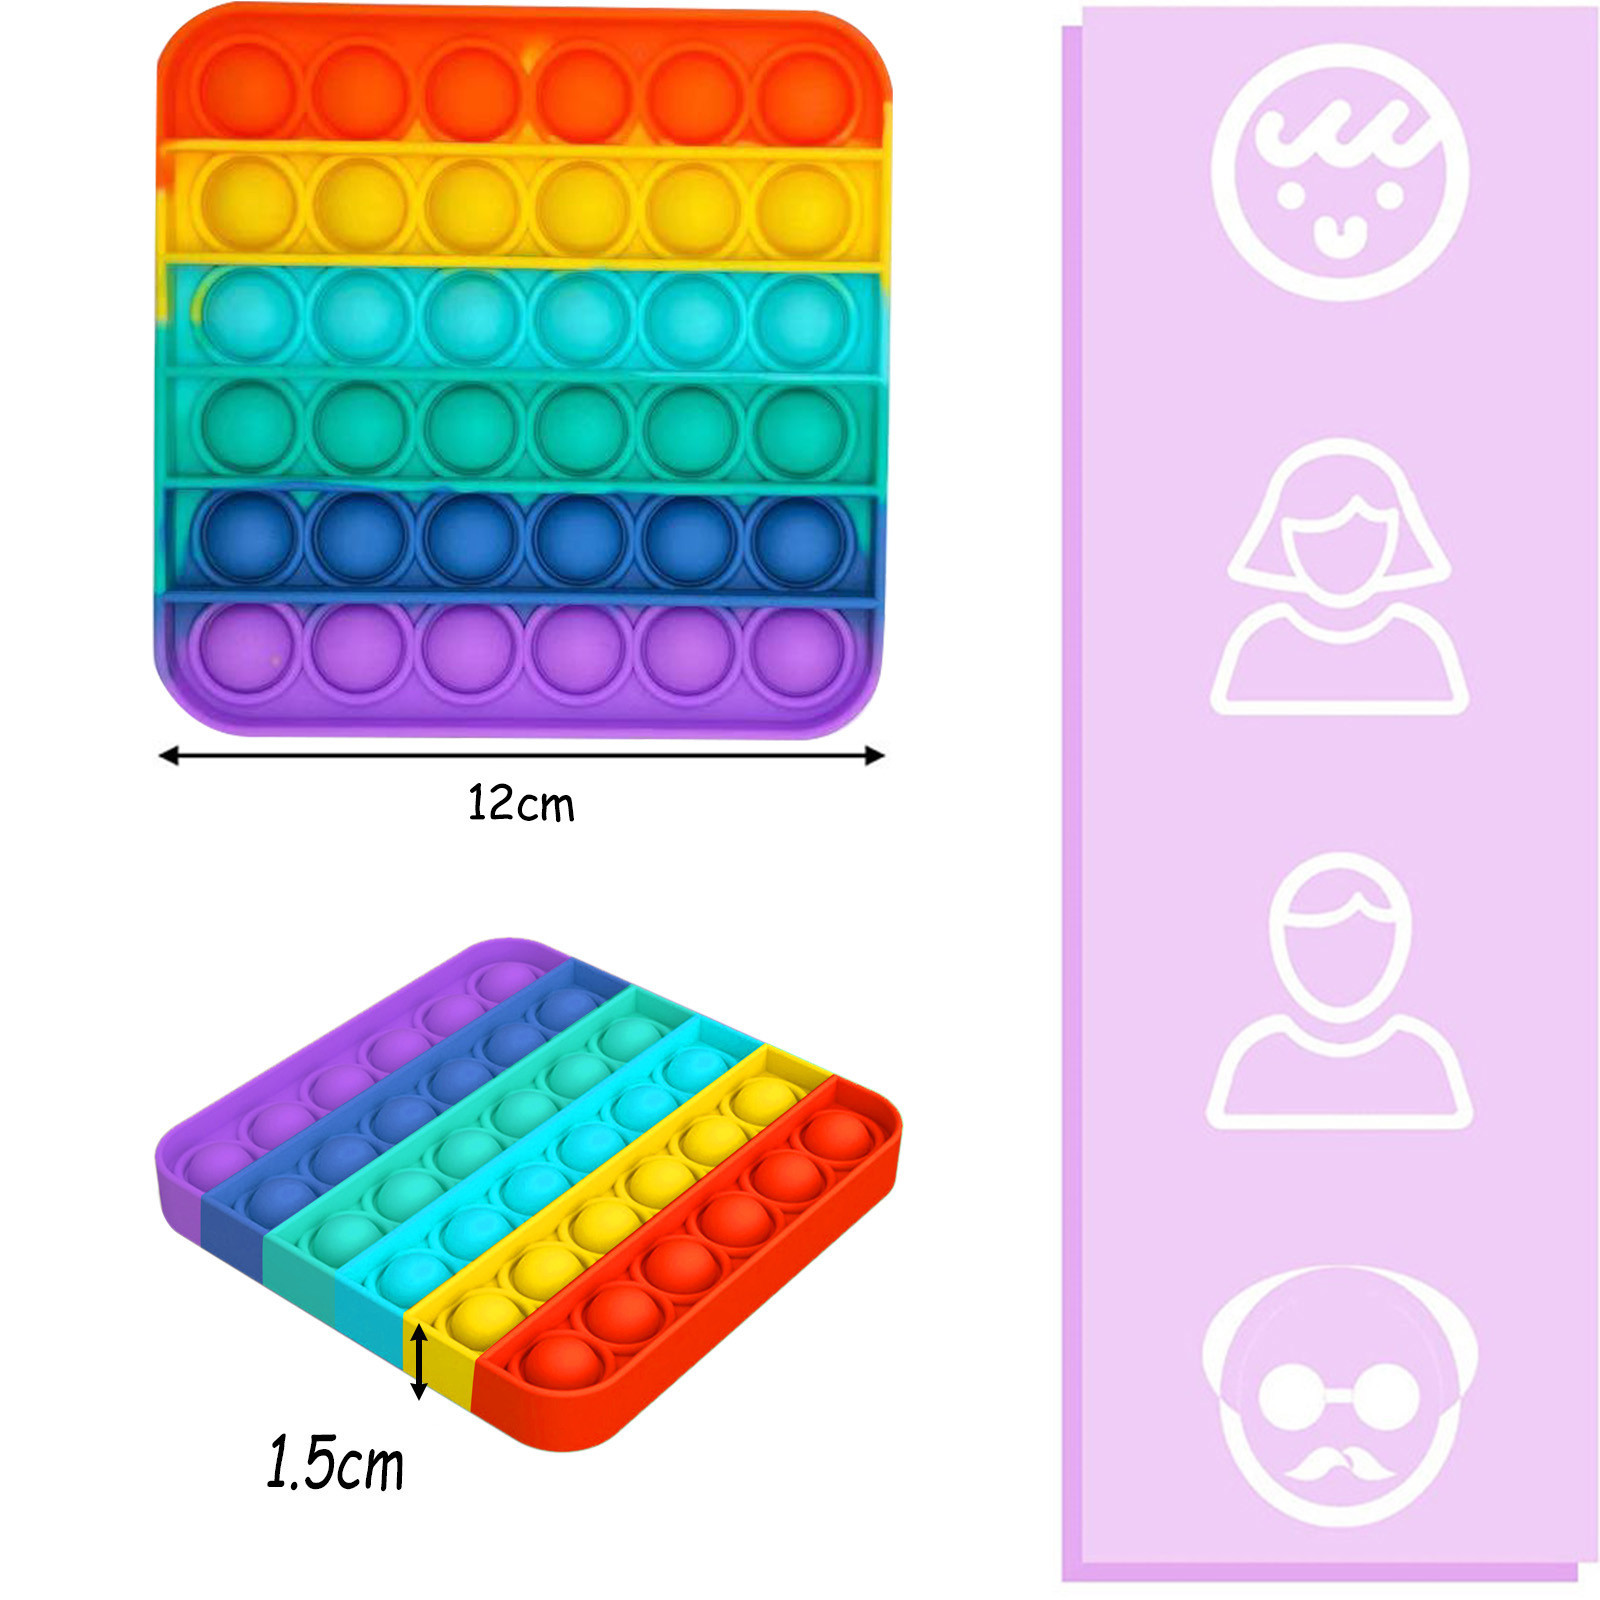 25 Pcs Fidges Fidget Toy Set Cheap Sensory Fidget Toys Pack for Kids and Adults Squishy img4